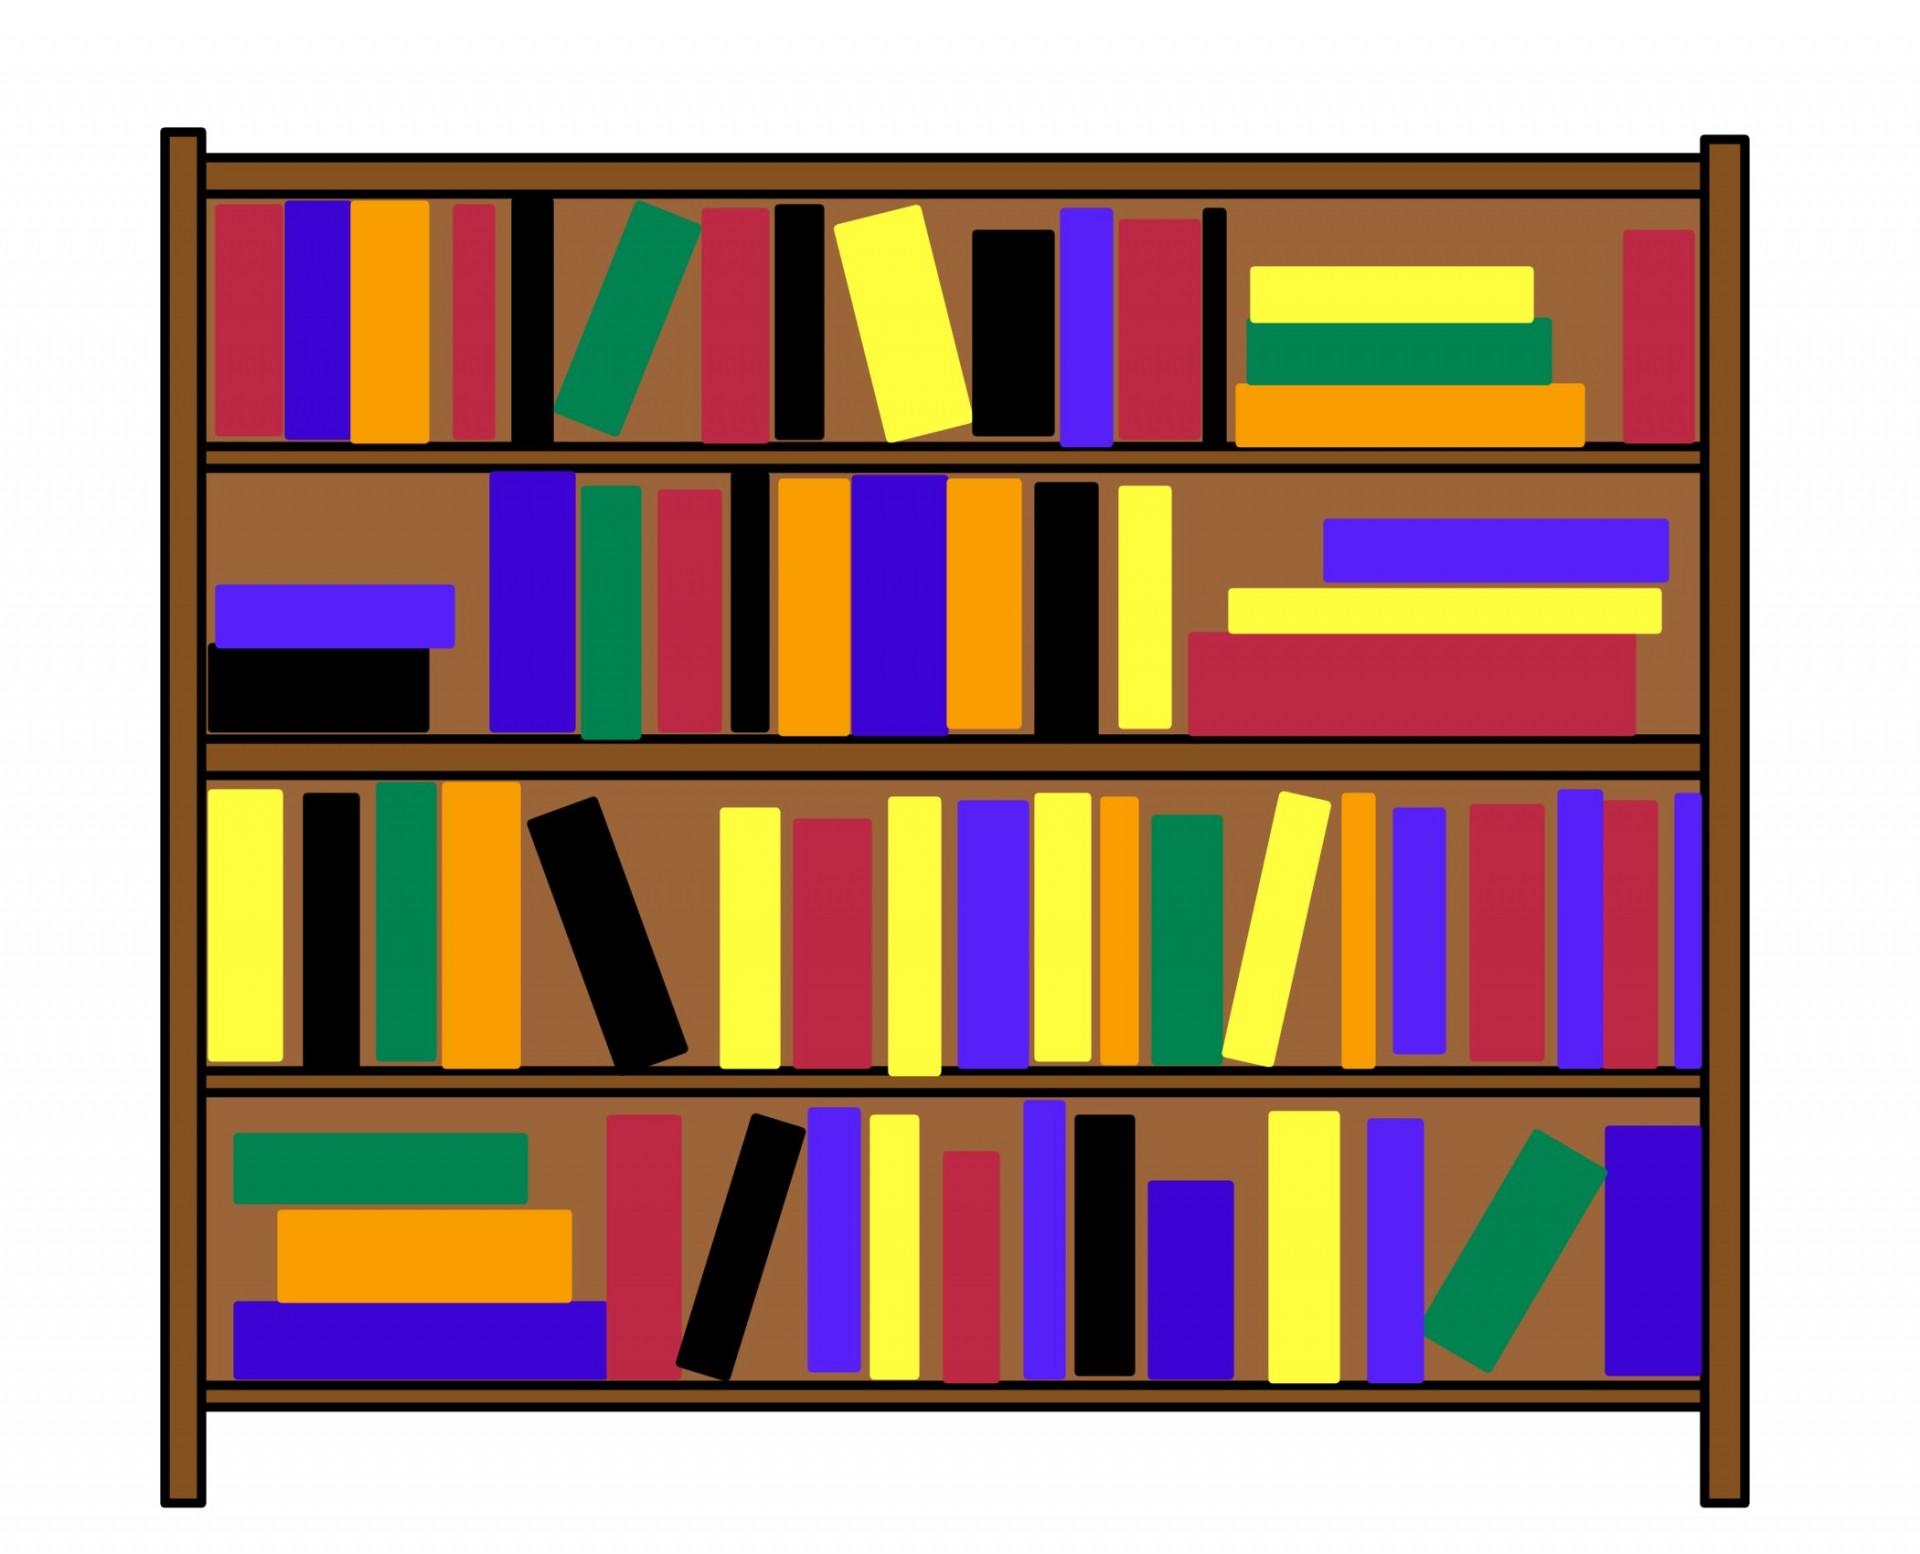 Free clipart bookshelf graphic download Free Bookshelf Cliparts, Download Free Clip Art, Free Clip Art on ... graphic download